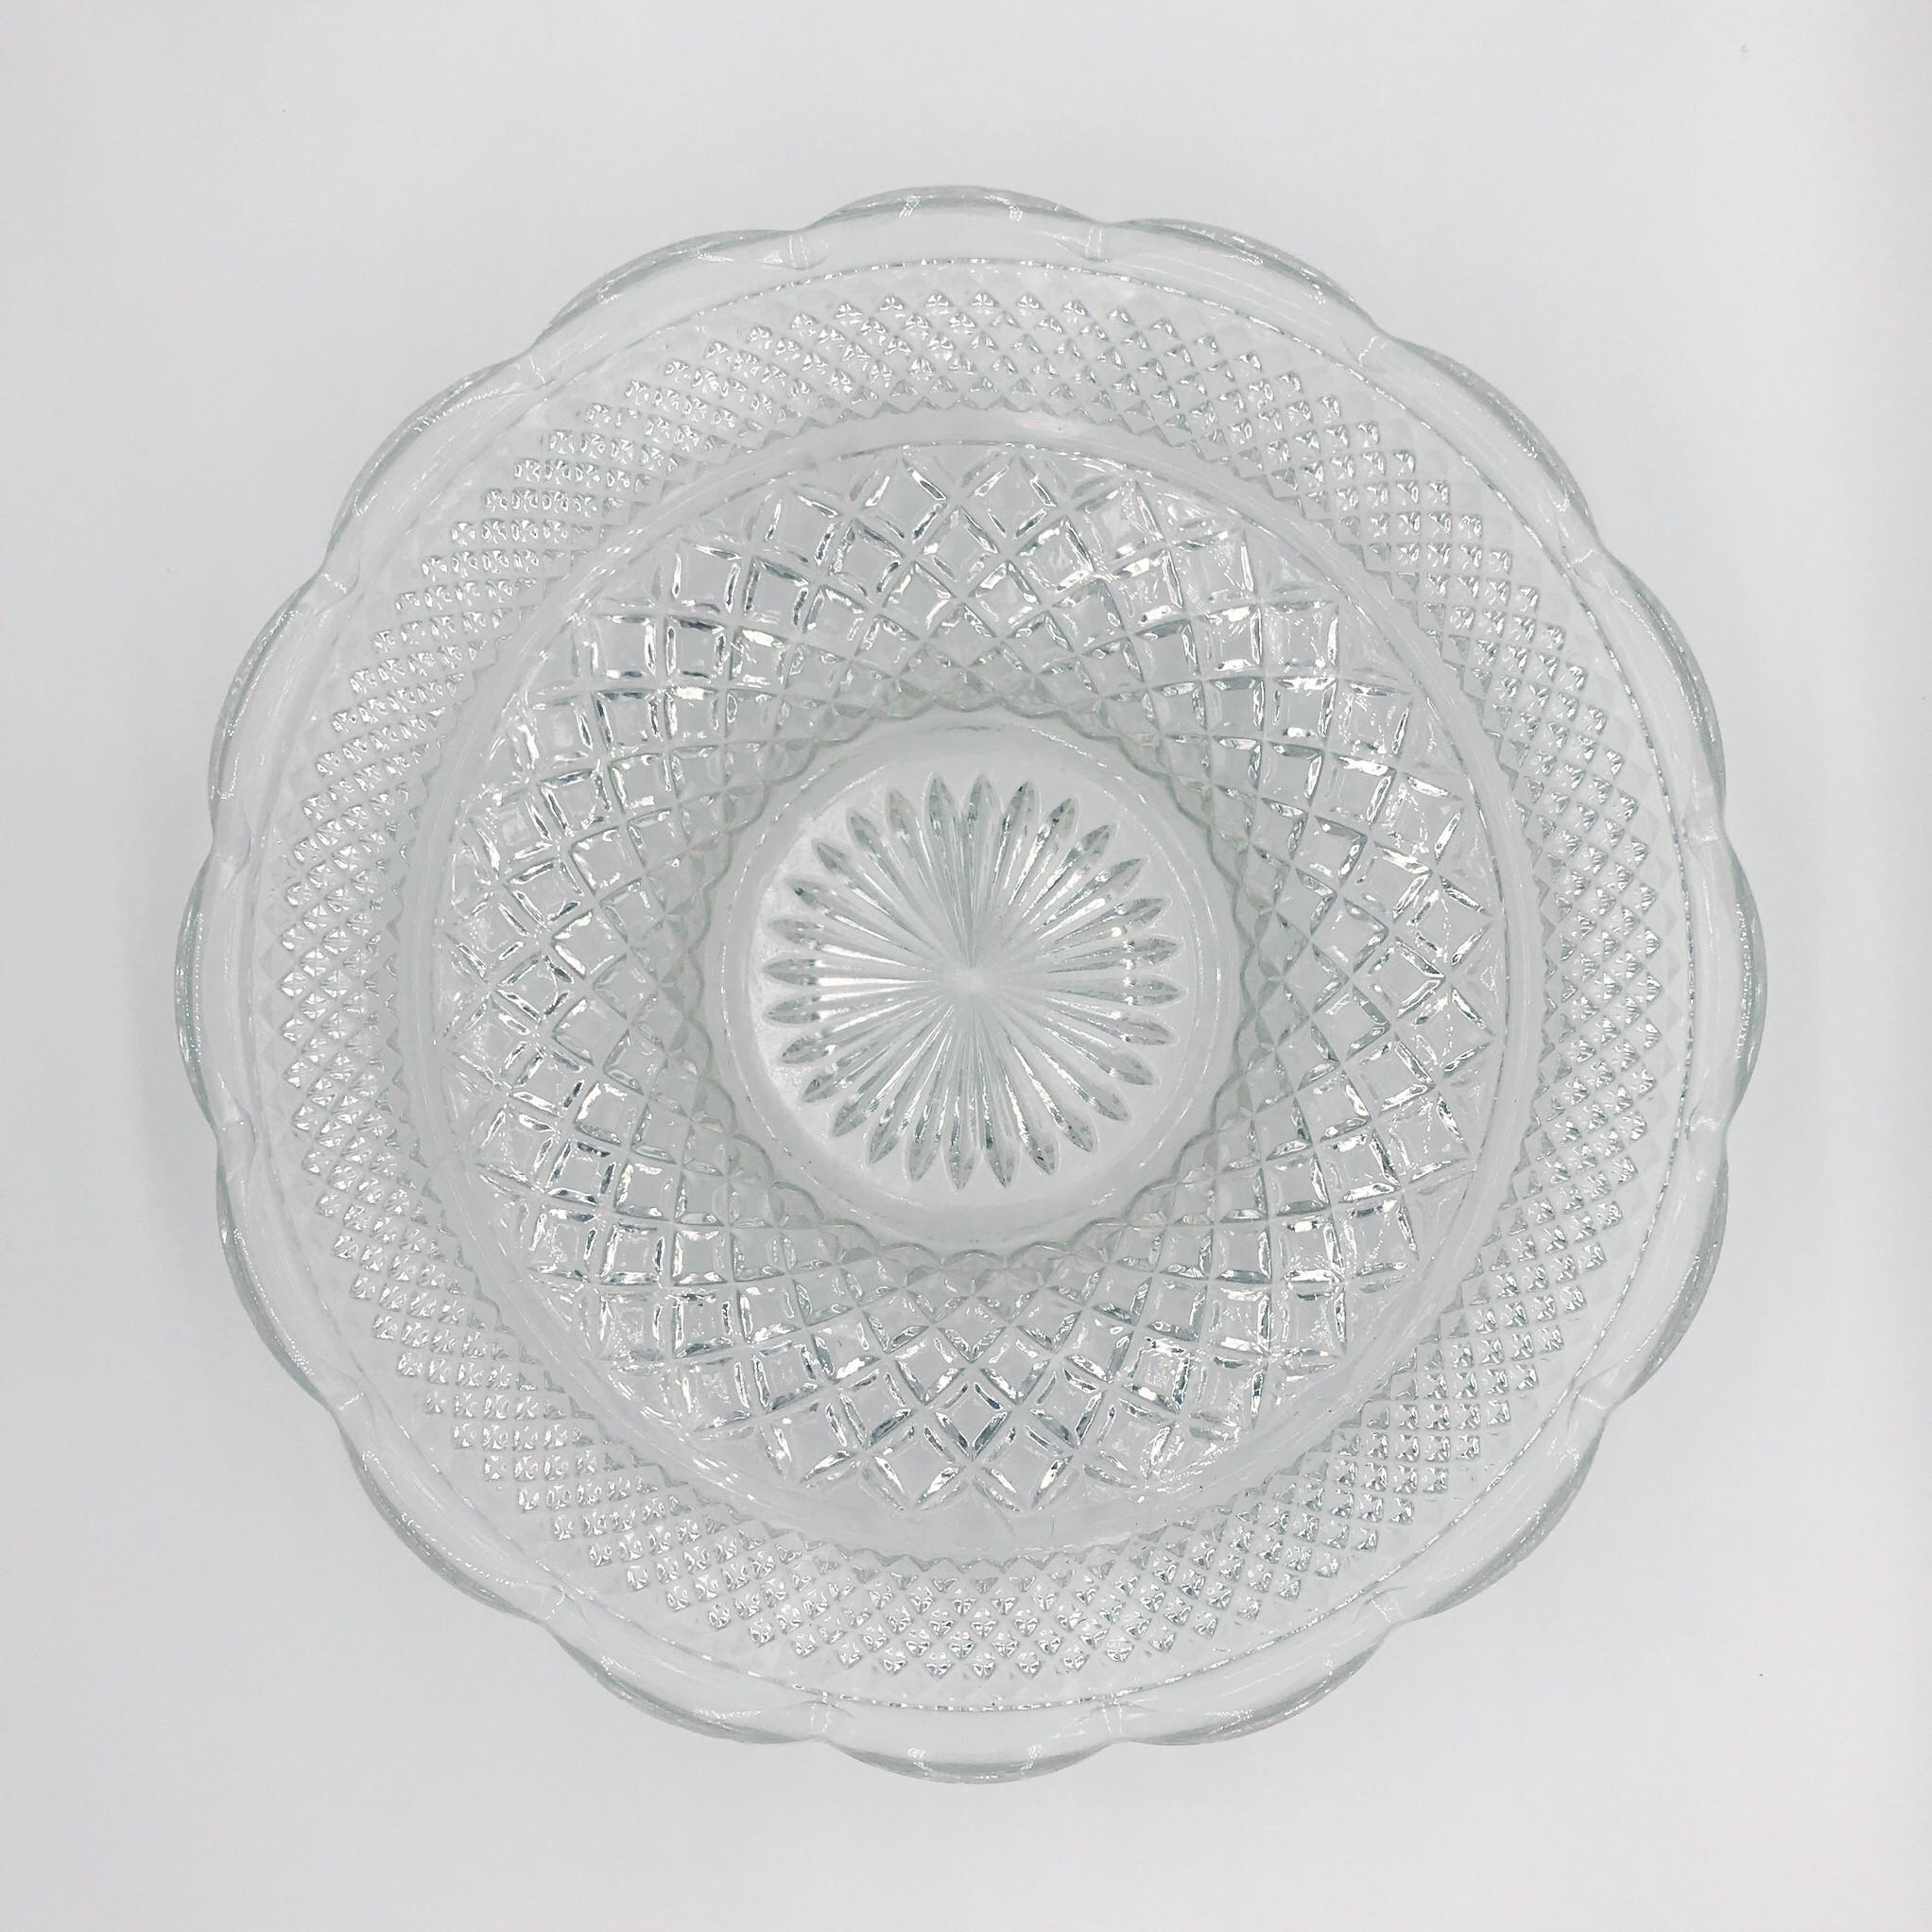 Serving bowl - vintage crystal (large)  Price: $12.00  Qty: 1